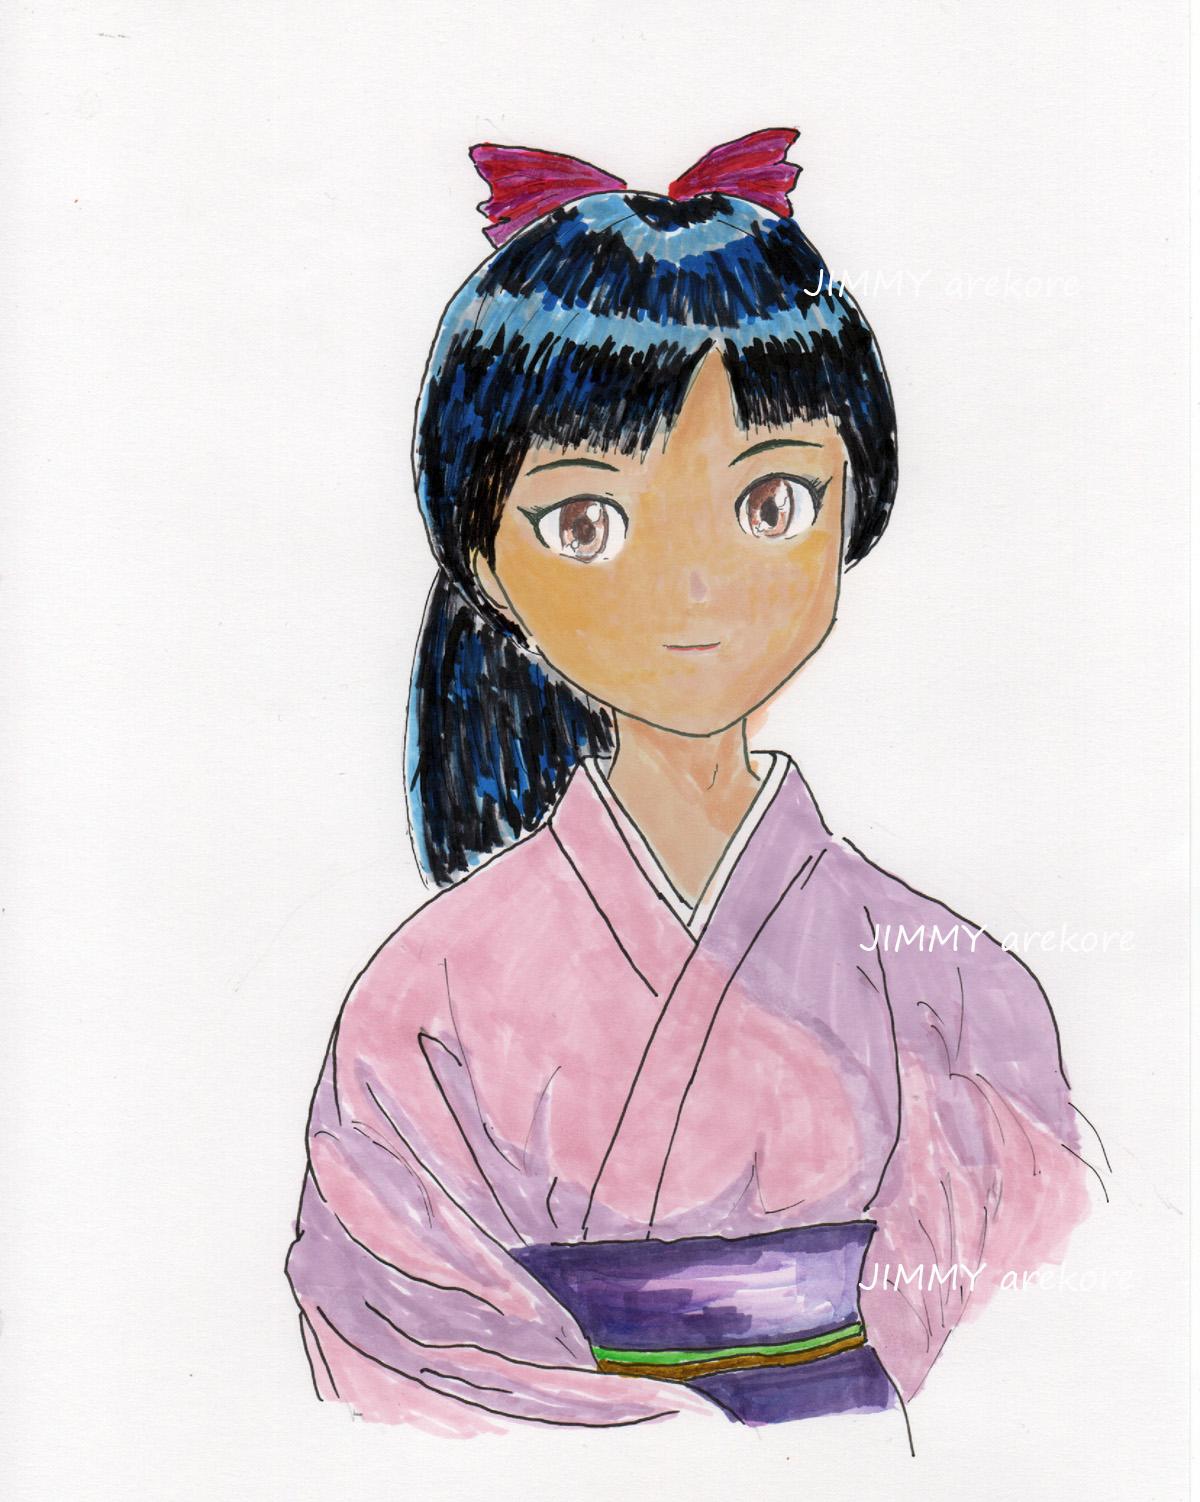 04_和服少女-COLOR002